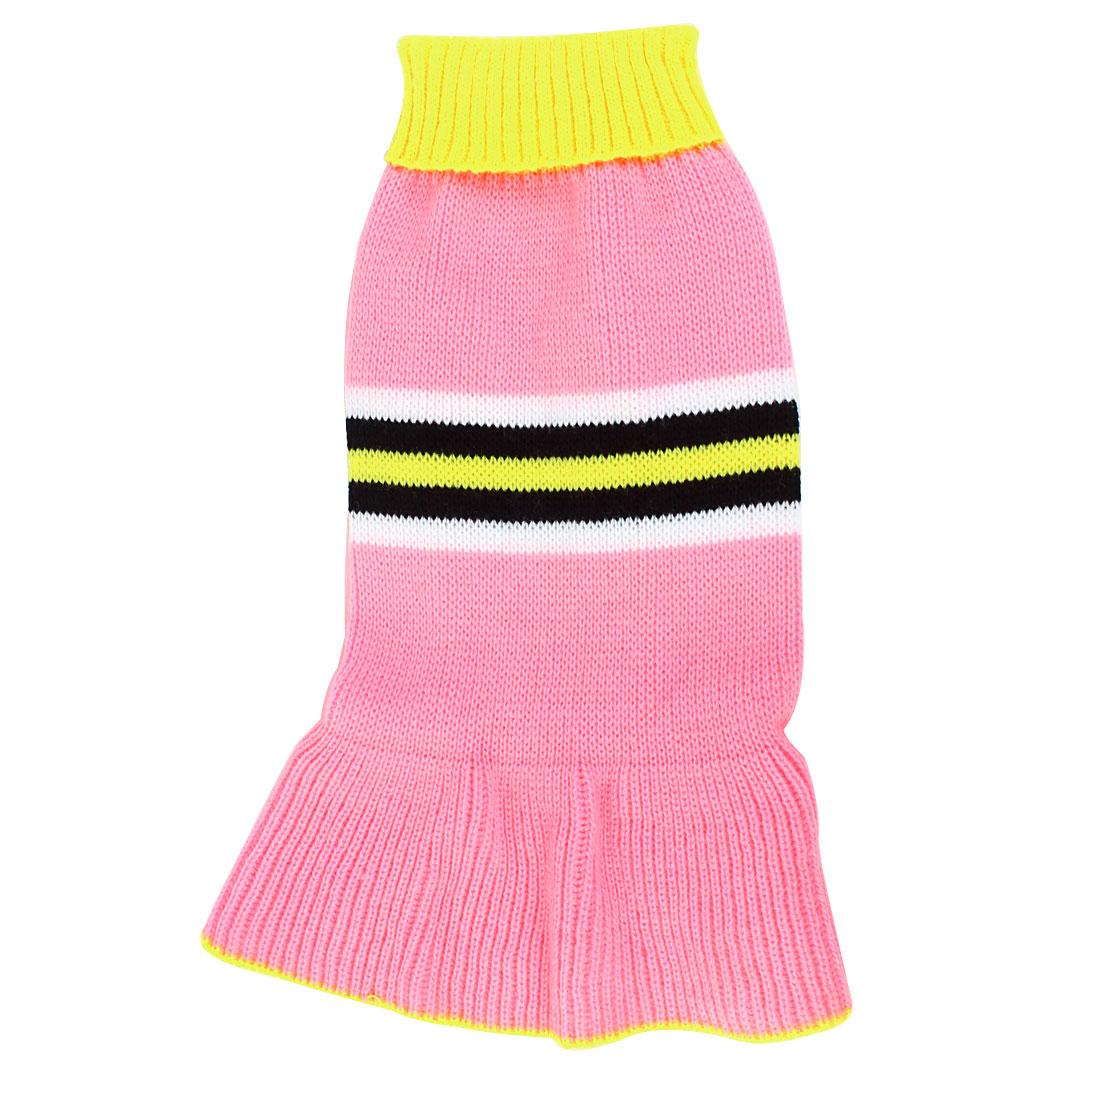 Pet Dog Pekingese Yellow Pink Ribbed Cuff Knitwear Turtleneck Dress Apparel Sweater Size M